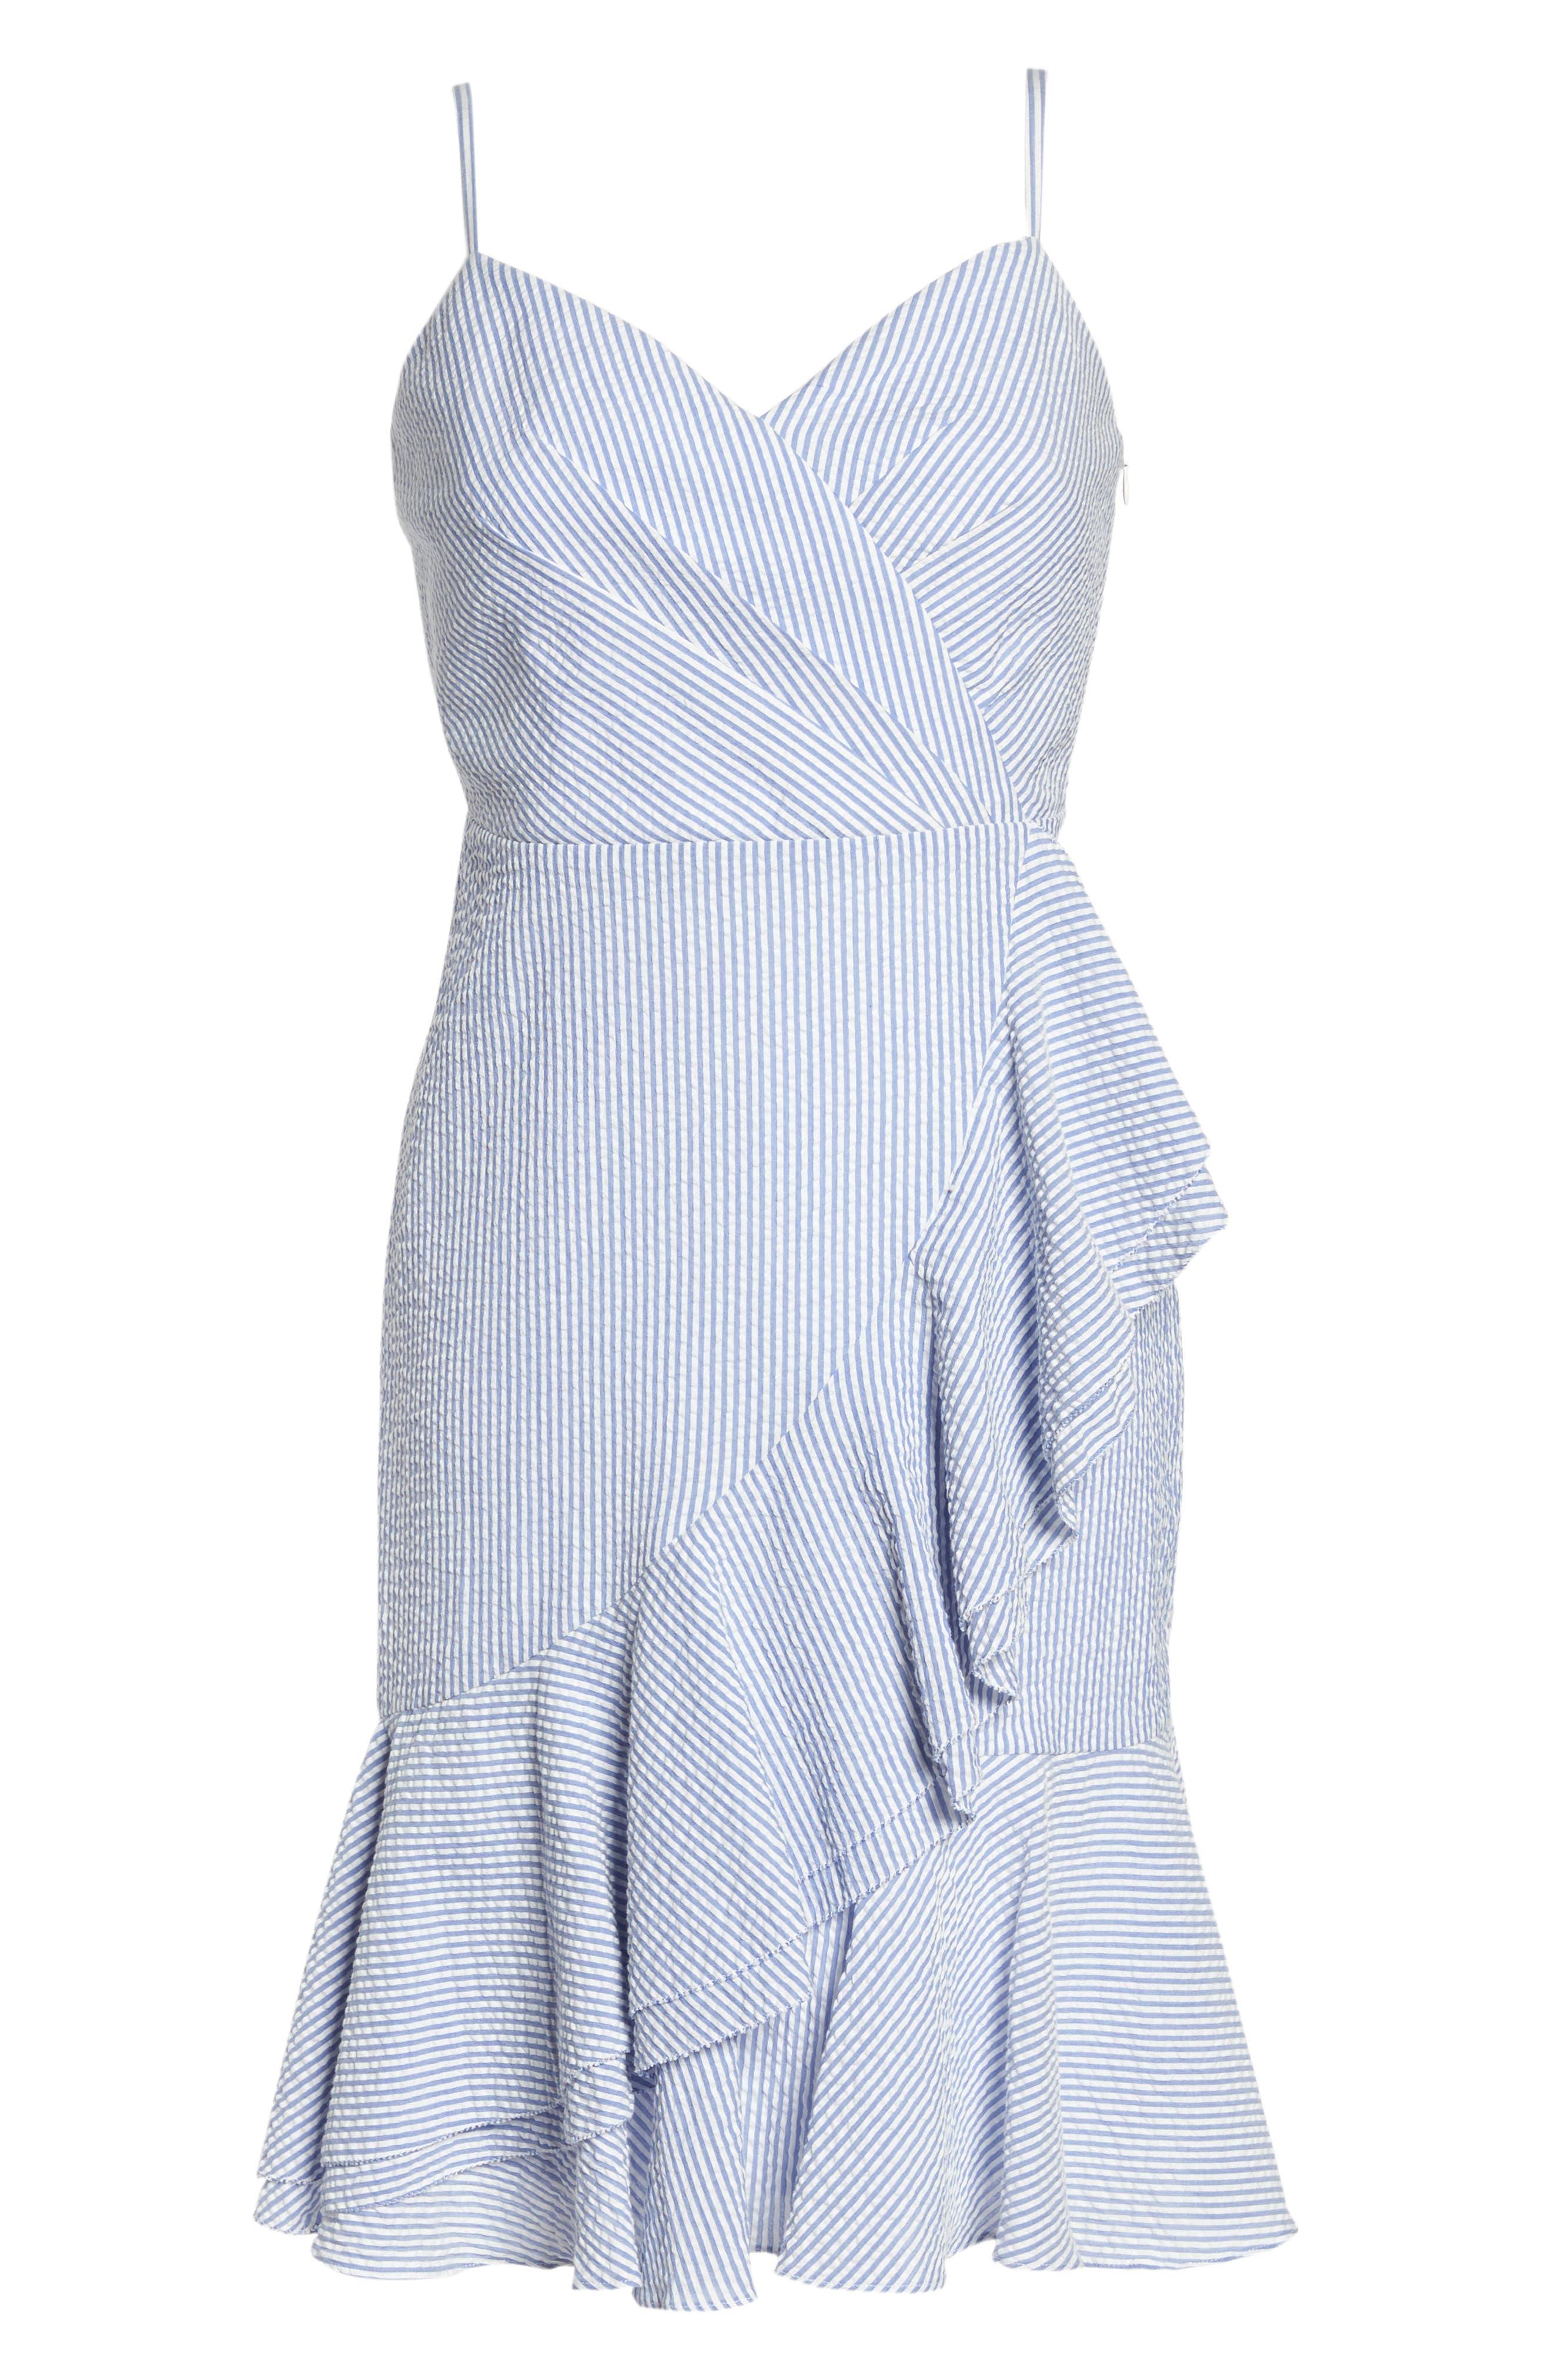 J.Crew Spaghetti Strap Ruffle Dress,                             Alternate thumbnail 6, color,                             Blue White